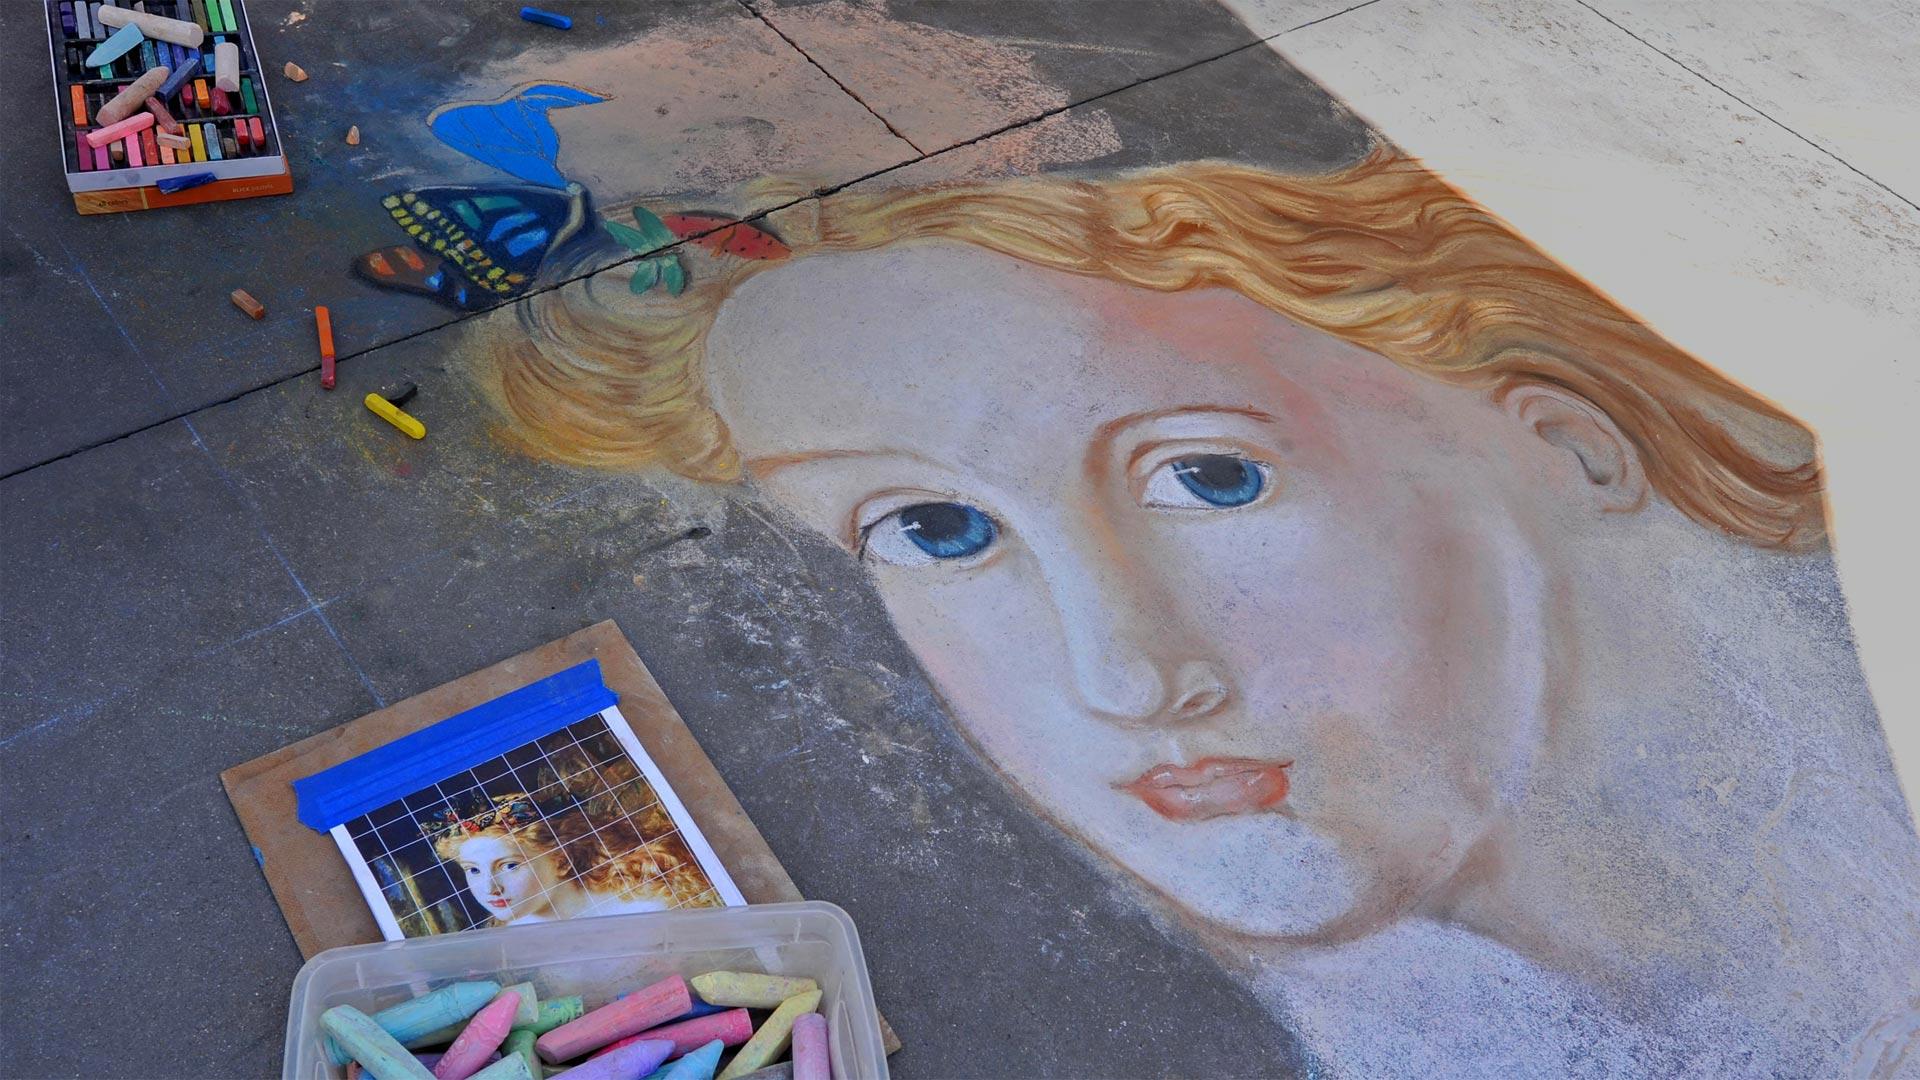 Street art from the Pasadena Chalk Festival 2013, California (© WENN US/Alamy)(Bing United States)